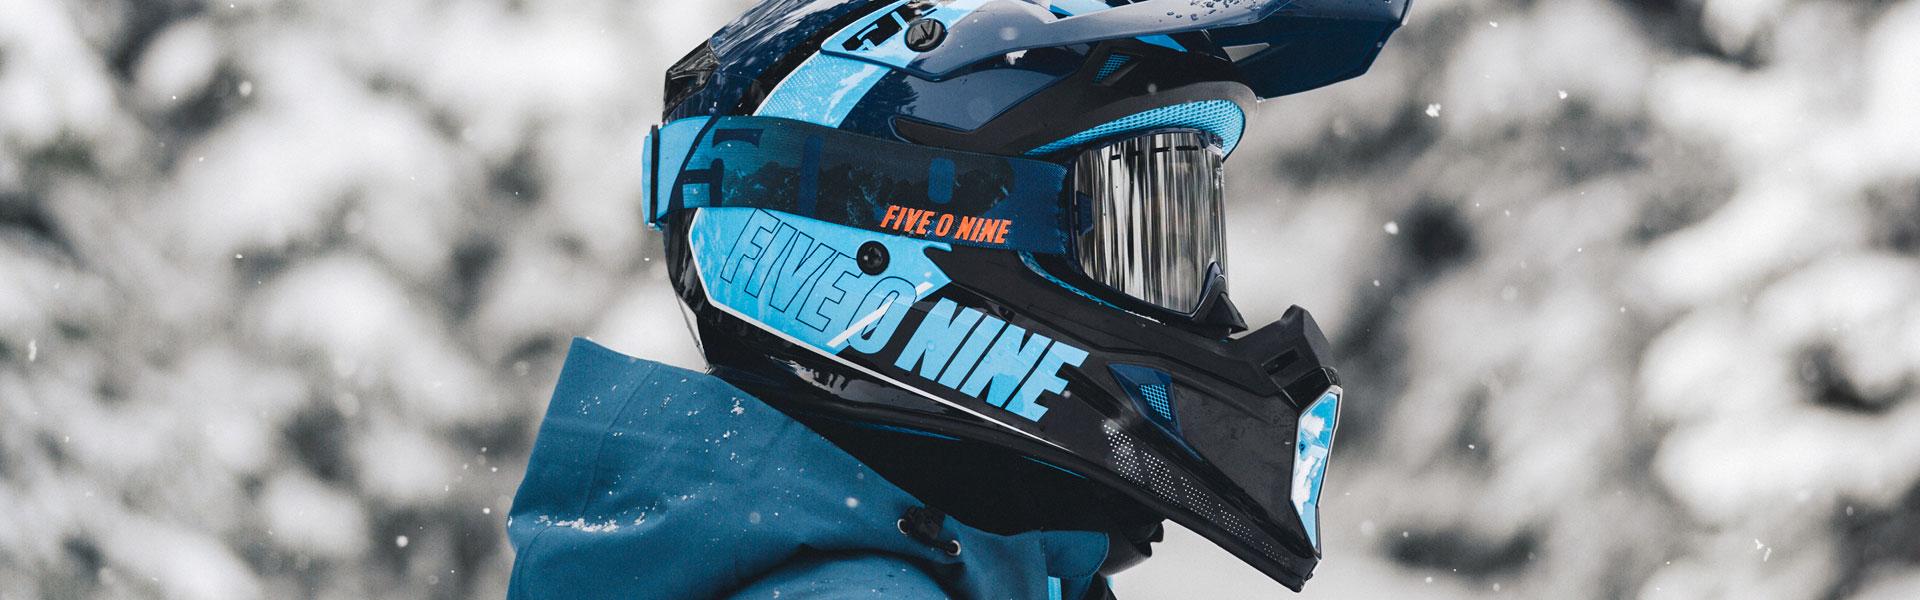 509 Kingpin Goggle